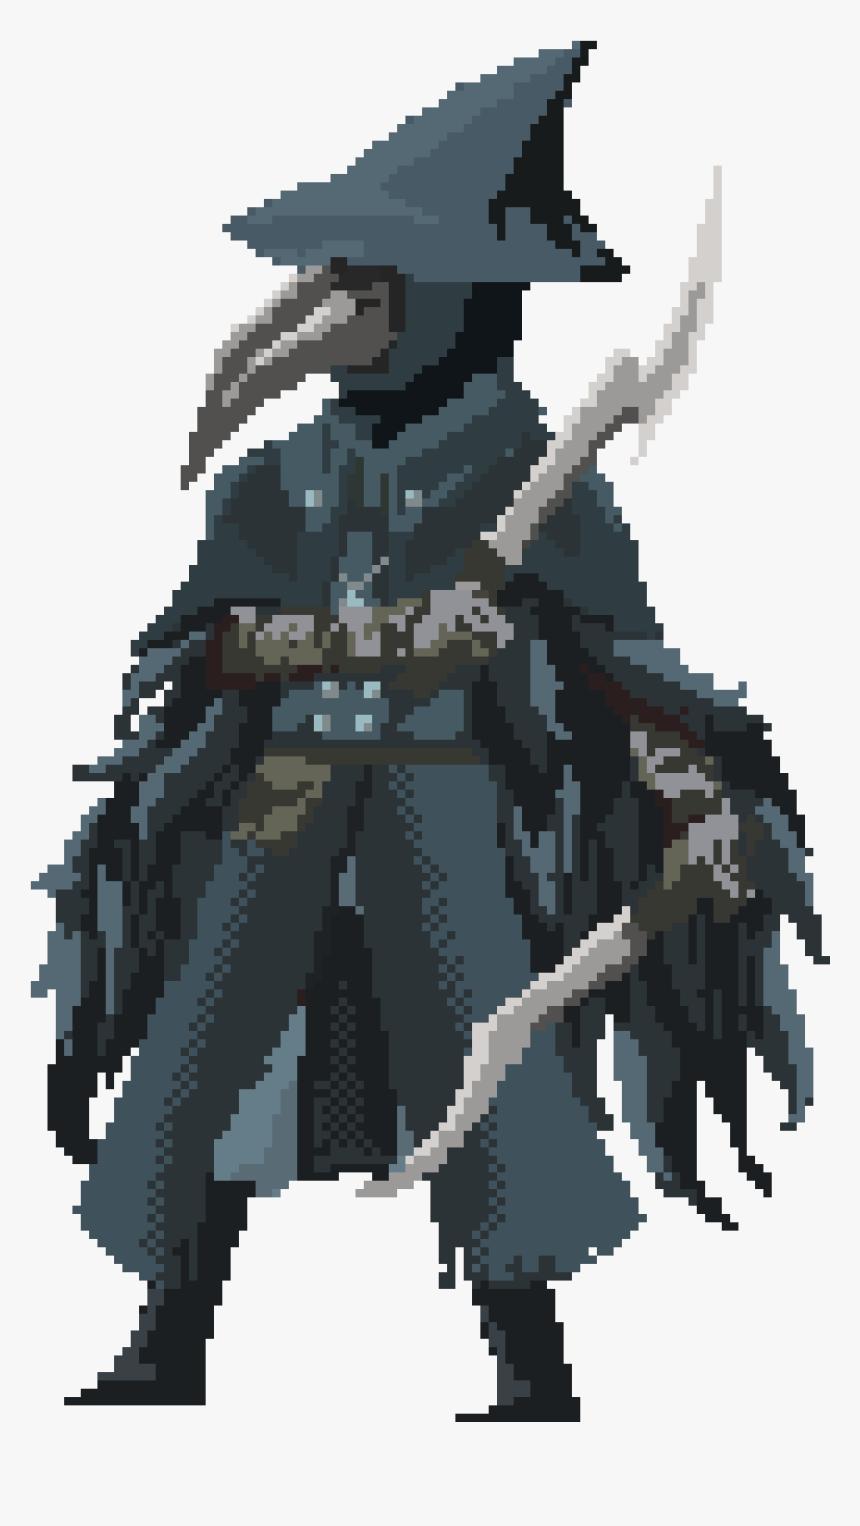 Bloodborne Pixel Art, HD Png Download, Free Download